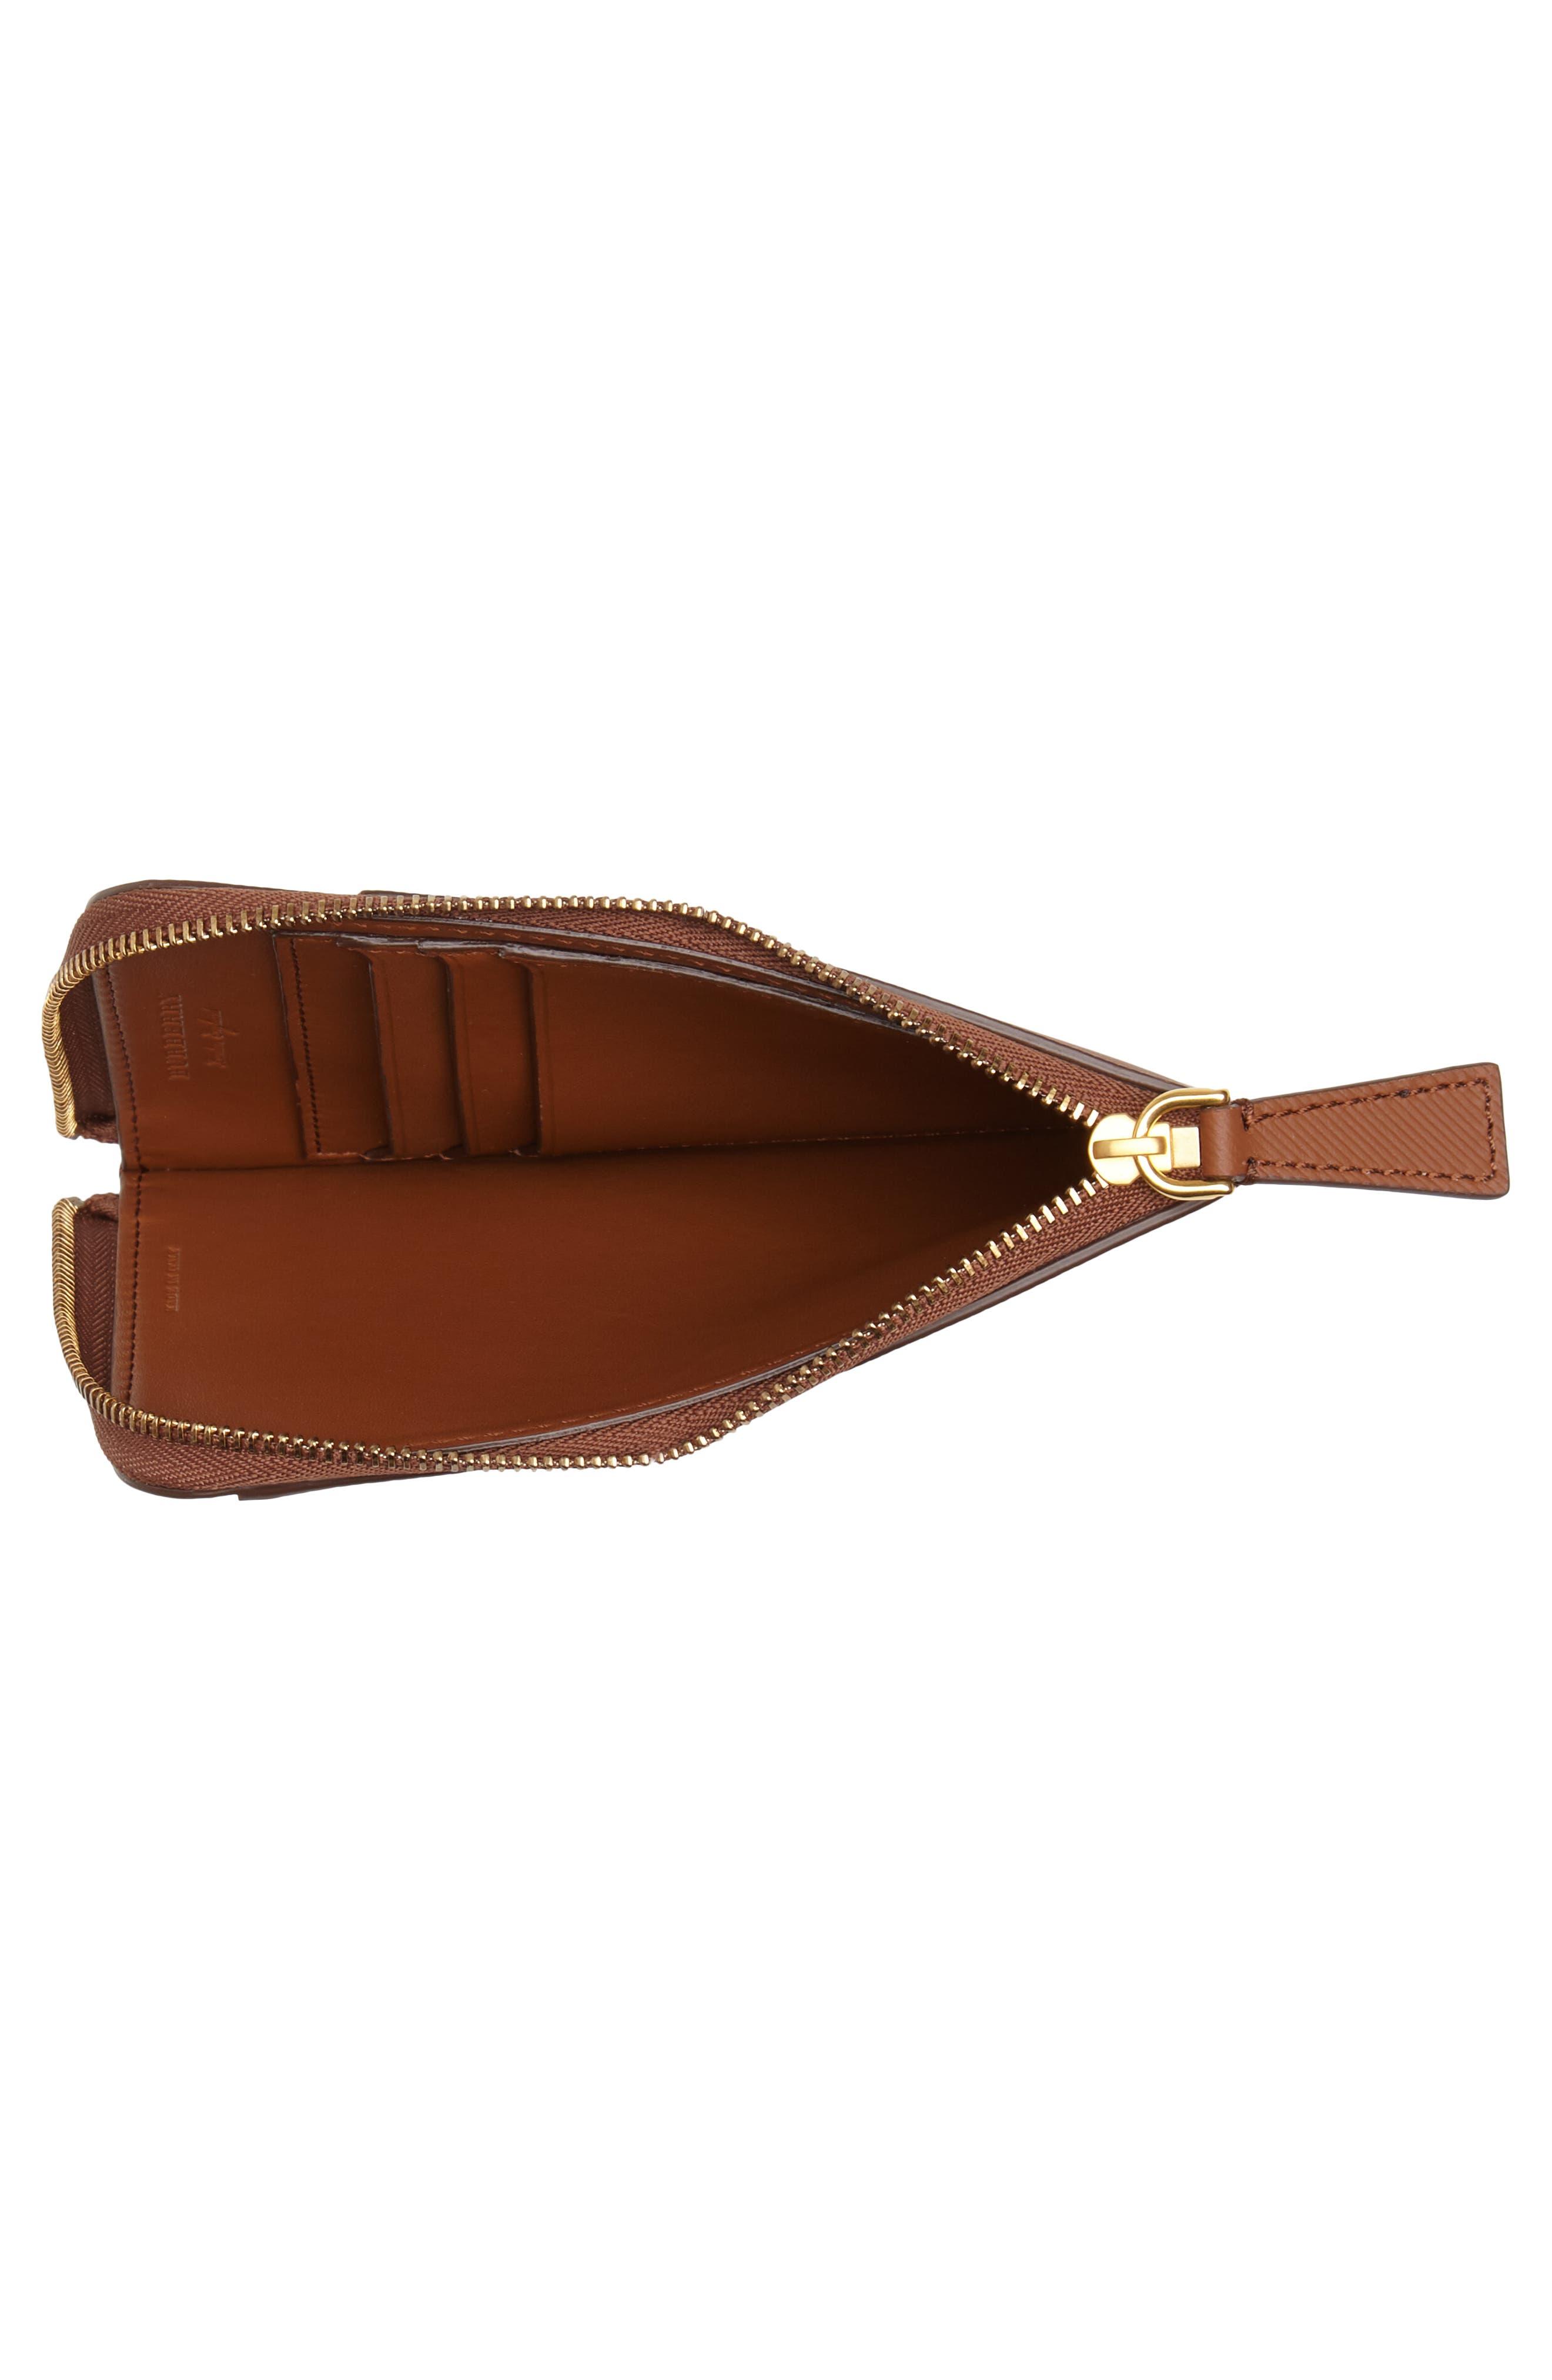 Alternate Image 3  - Burberry Zain Leather Passport Case